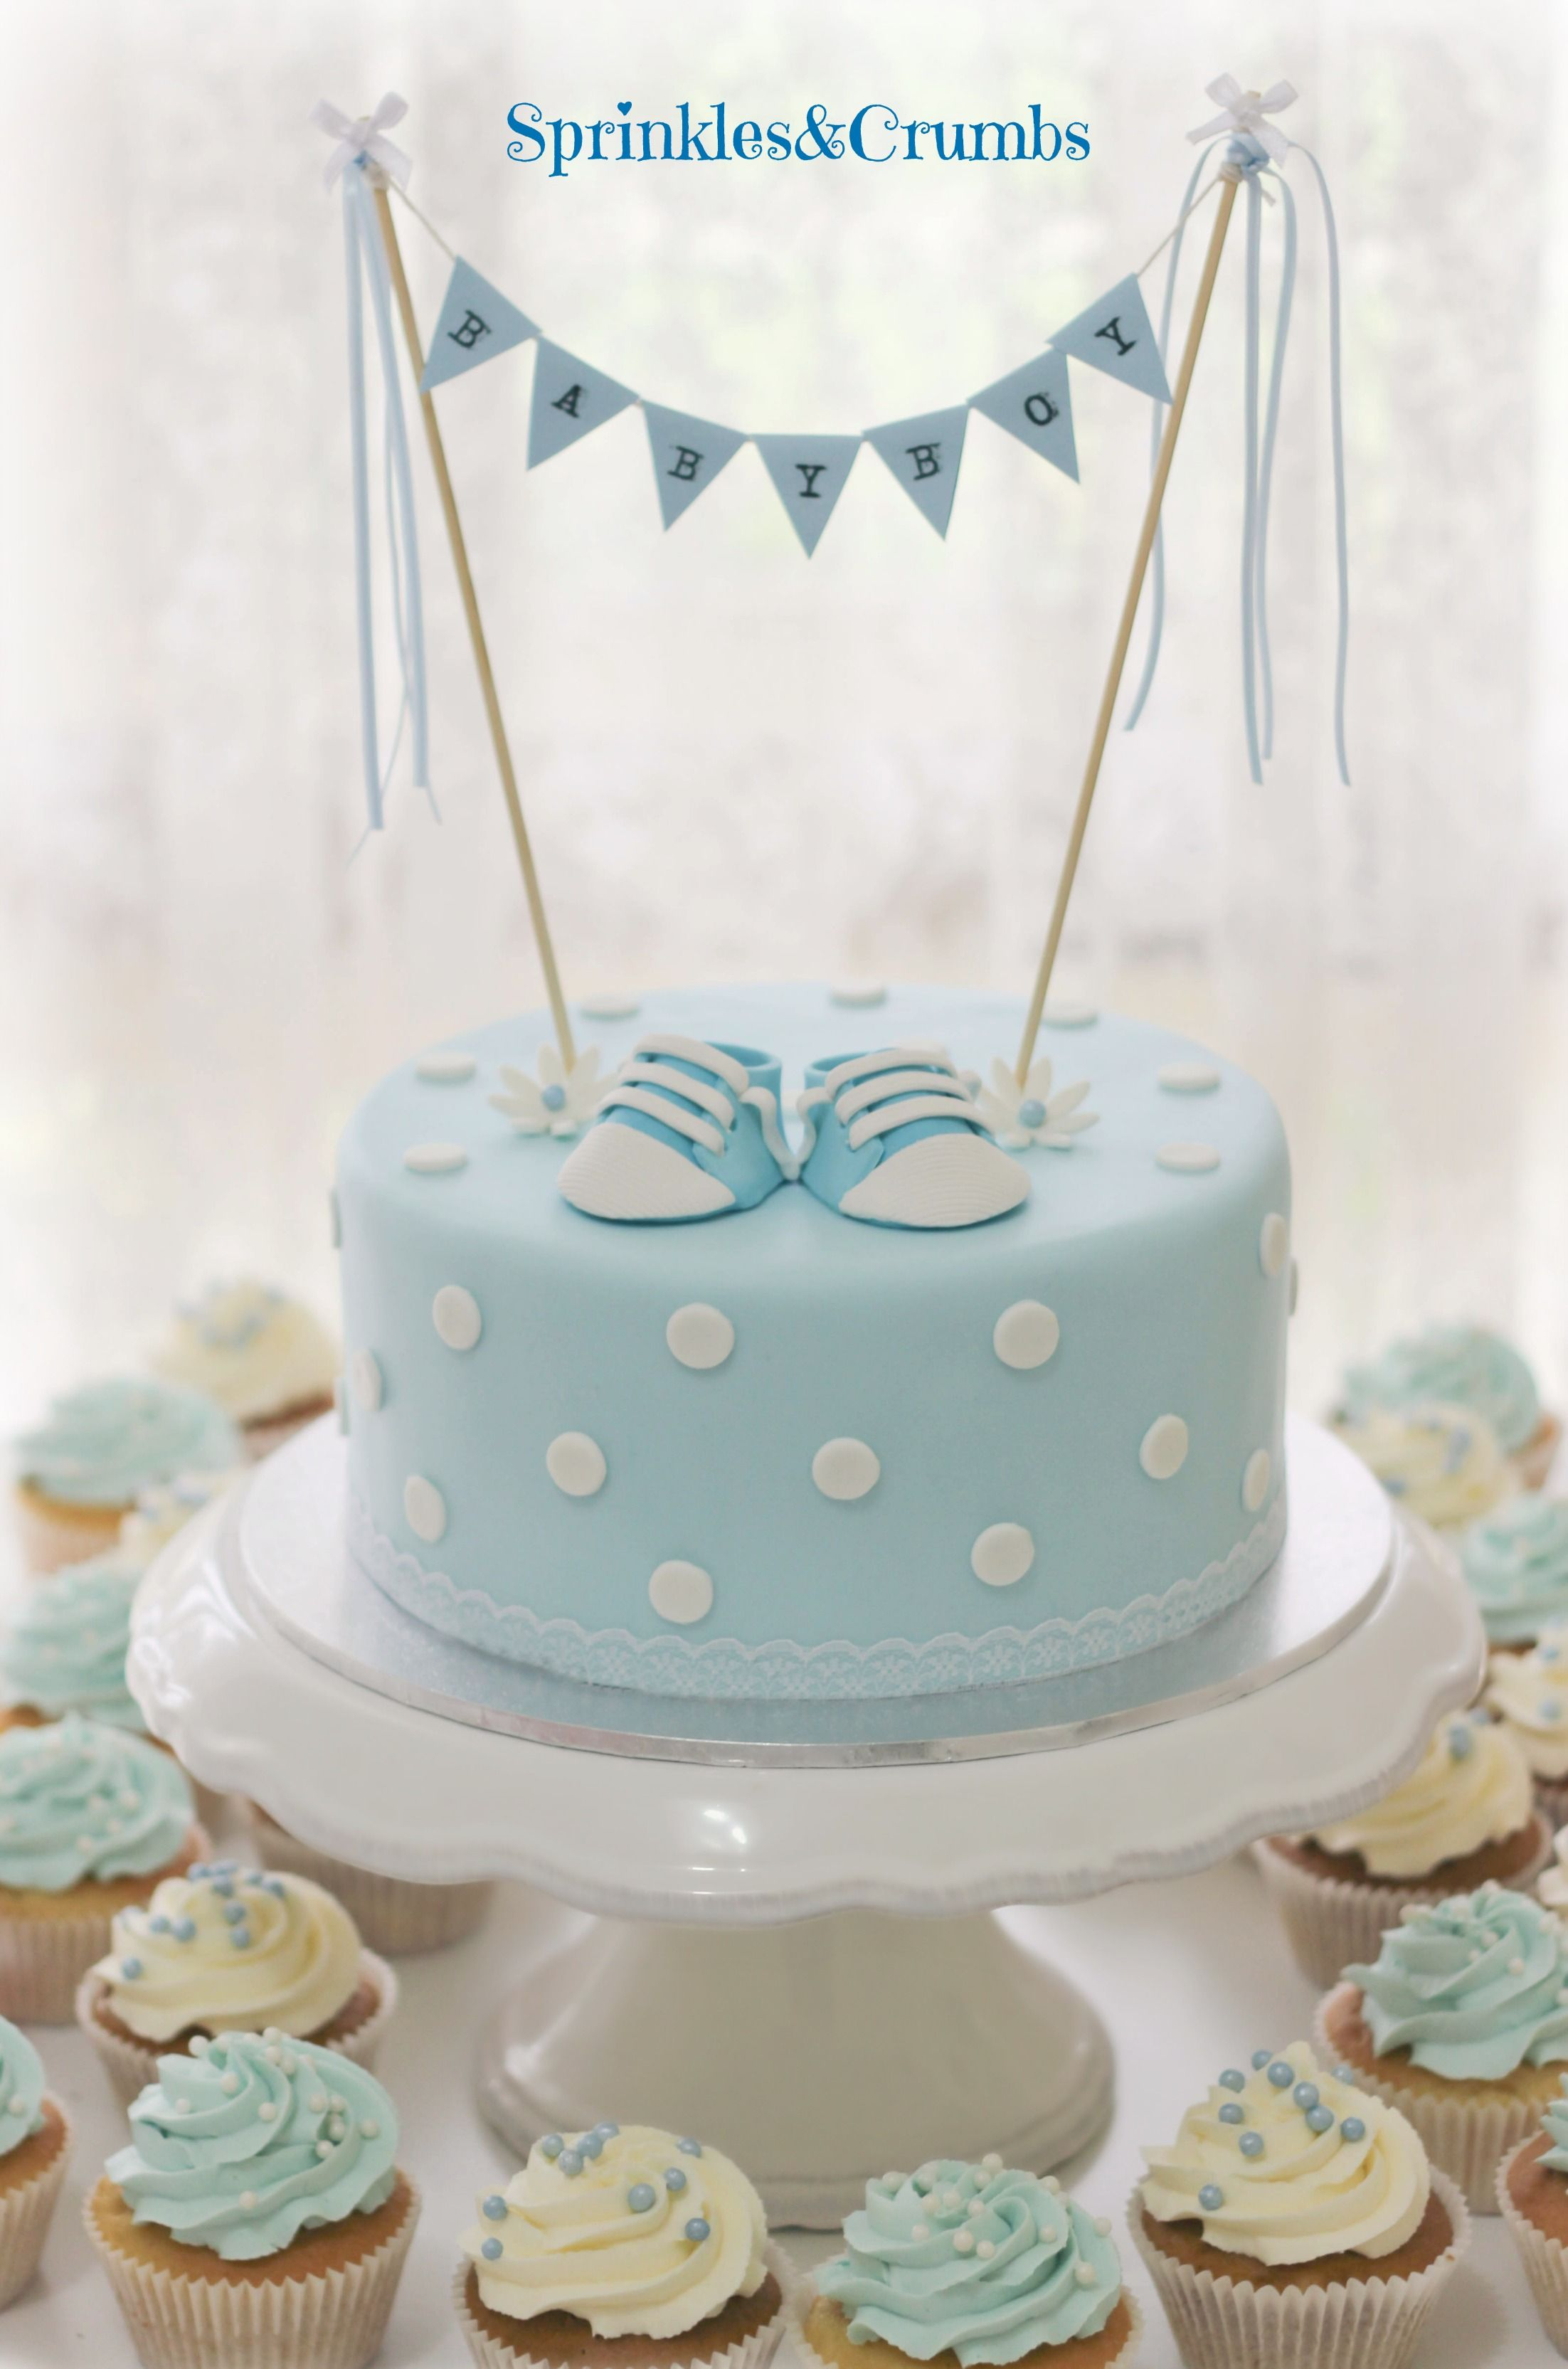 Cake Topper For Baby Sprinkle